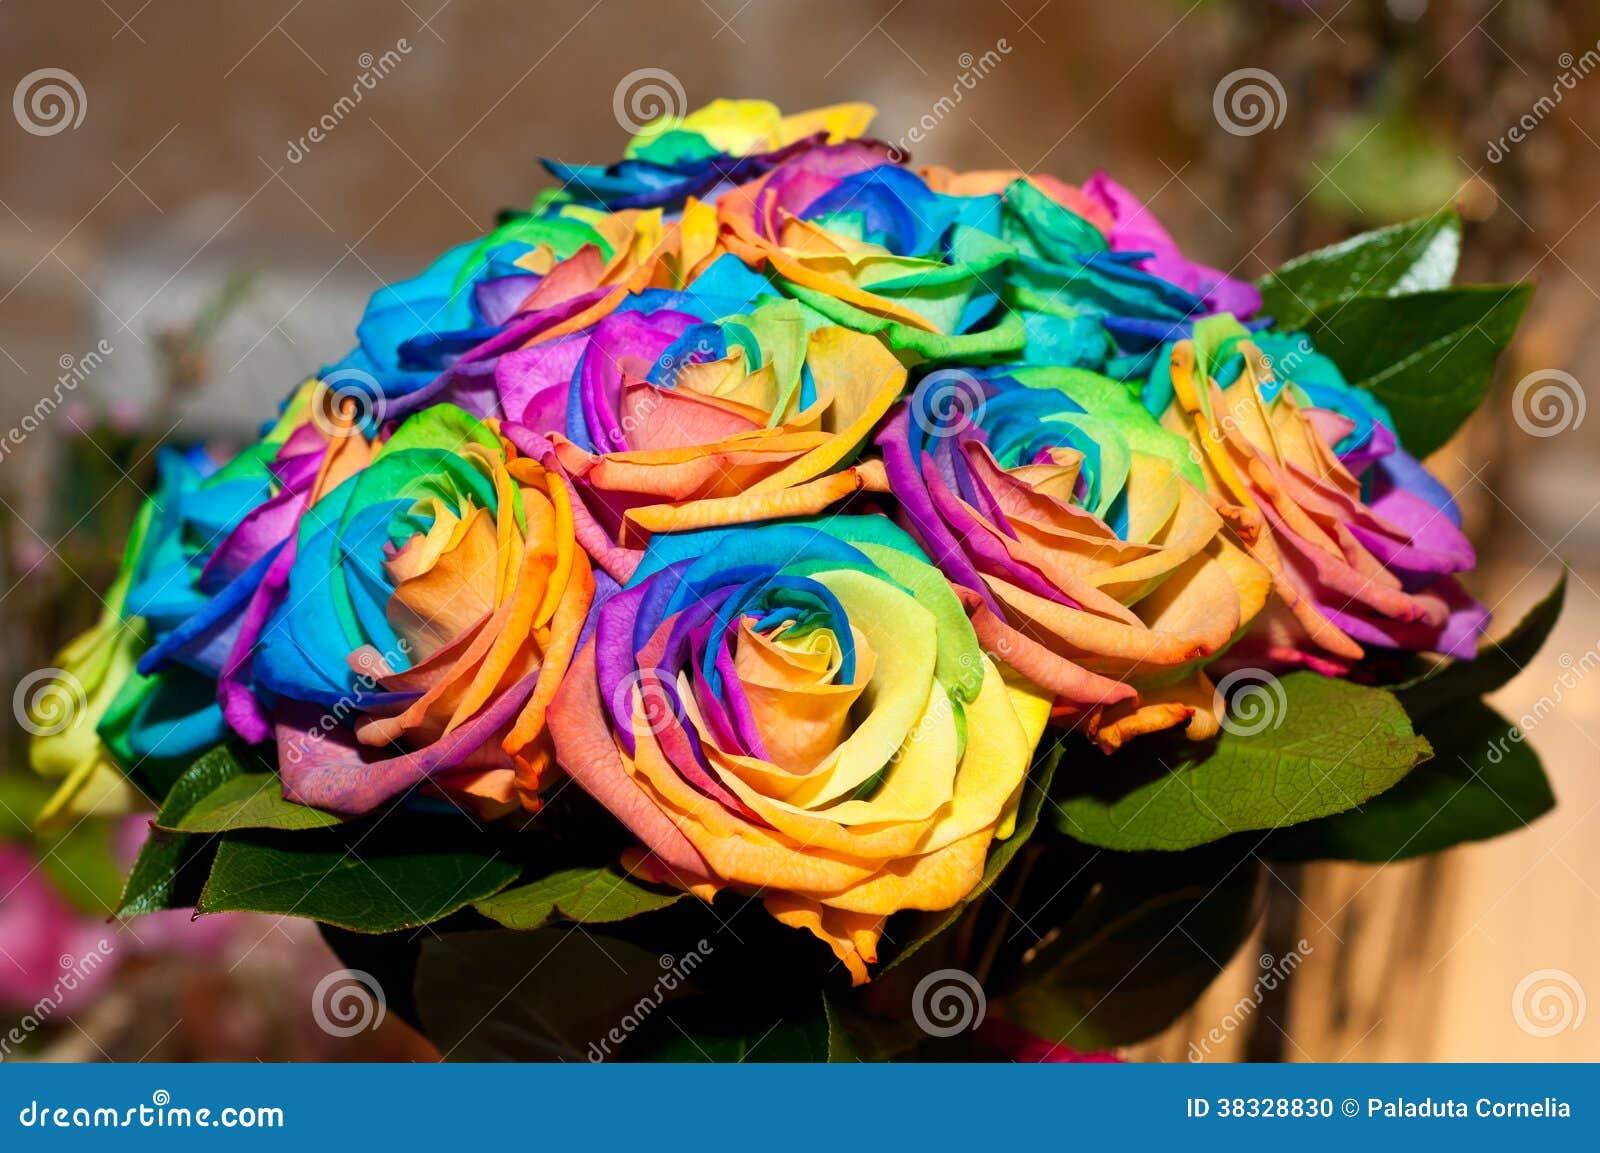 Wedding Bouquet With Rainbow Roses Stock Photo Image Of Elegant